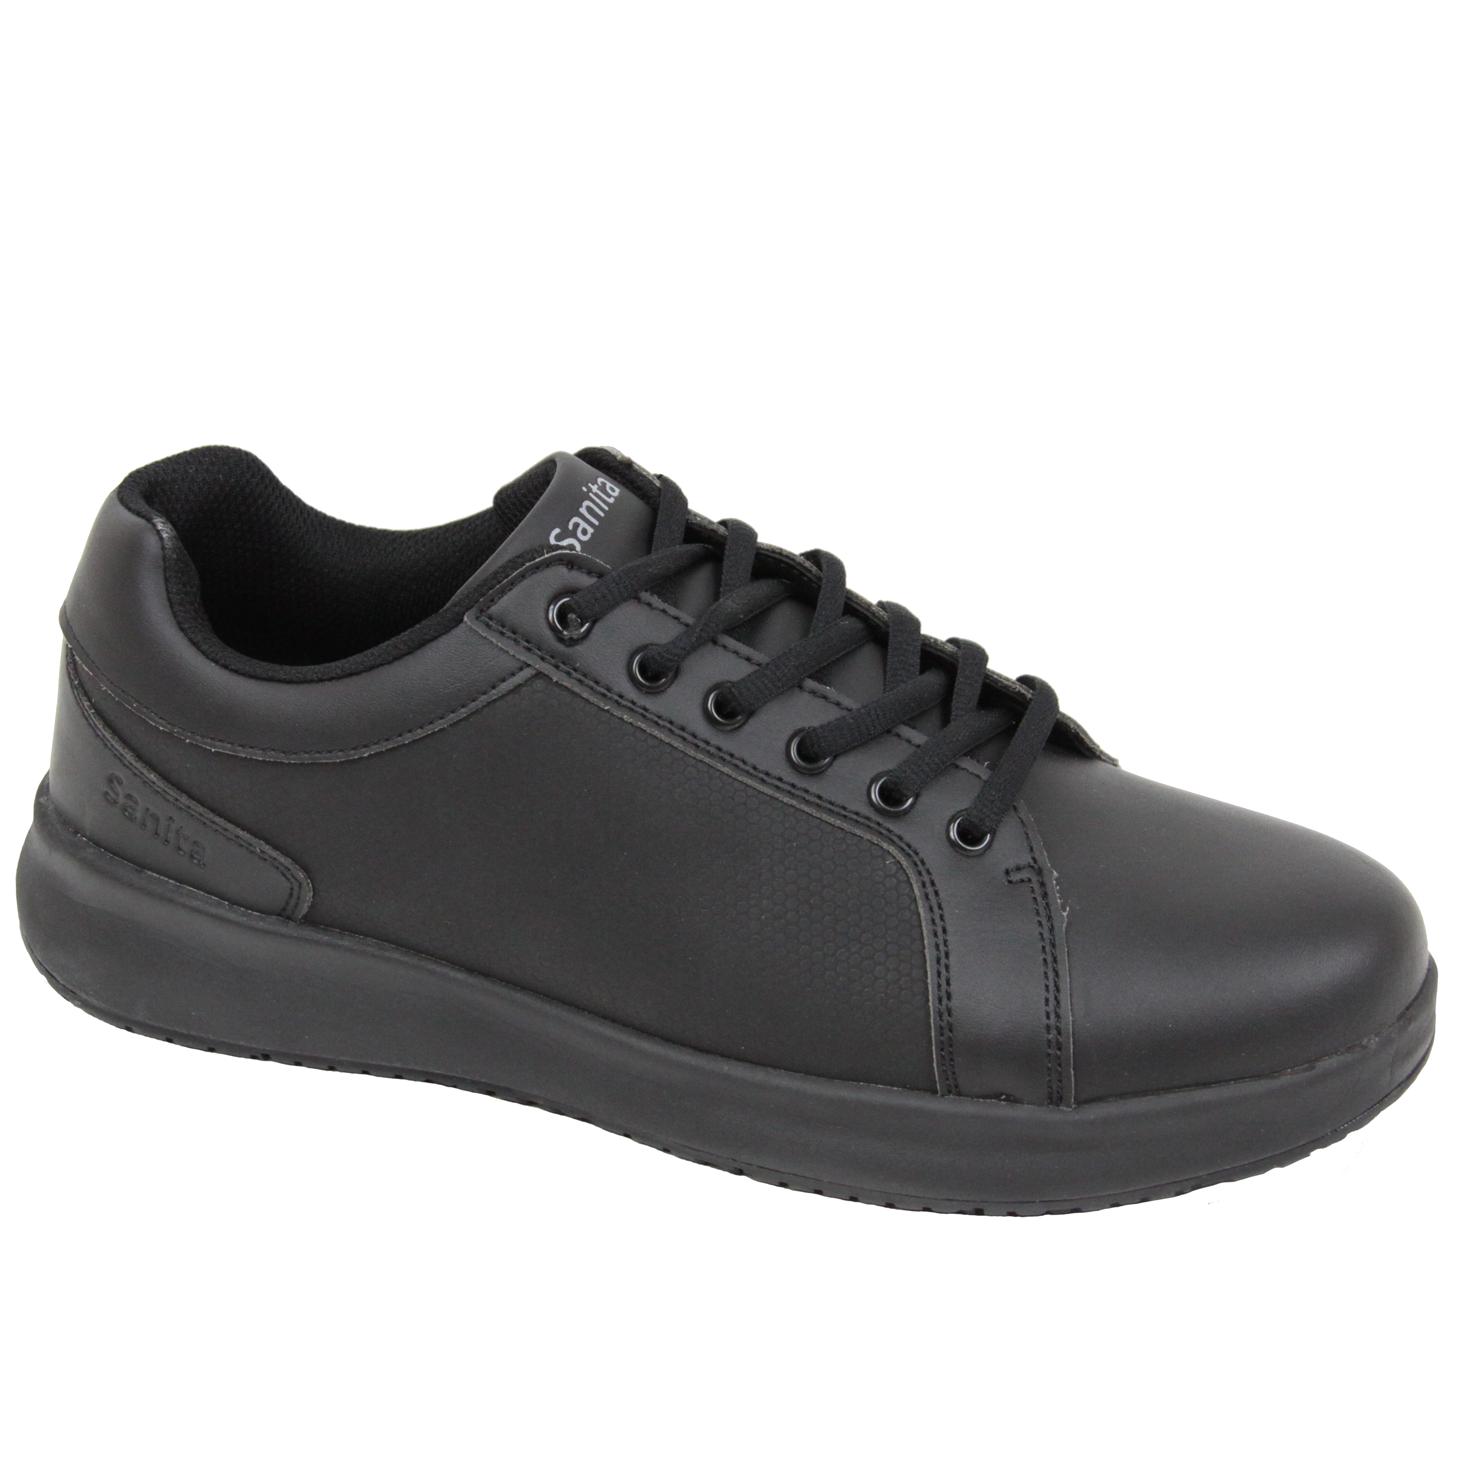 CONVEX Unisex Safety Sneaker-Sanita